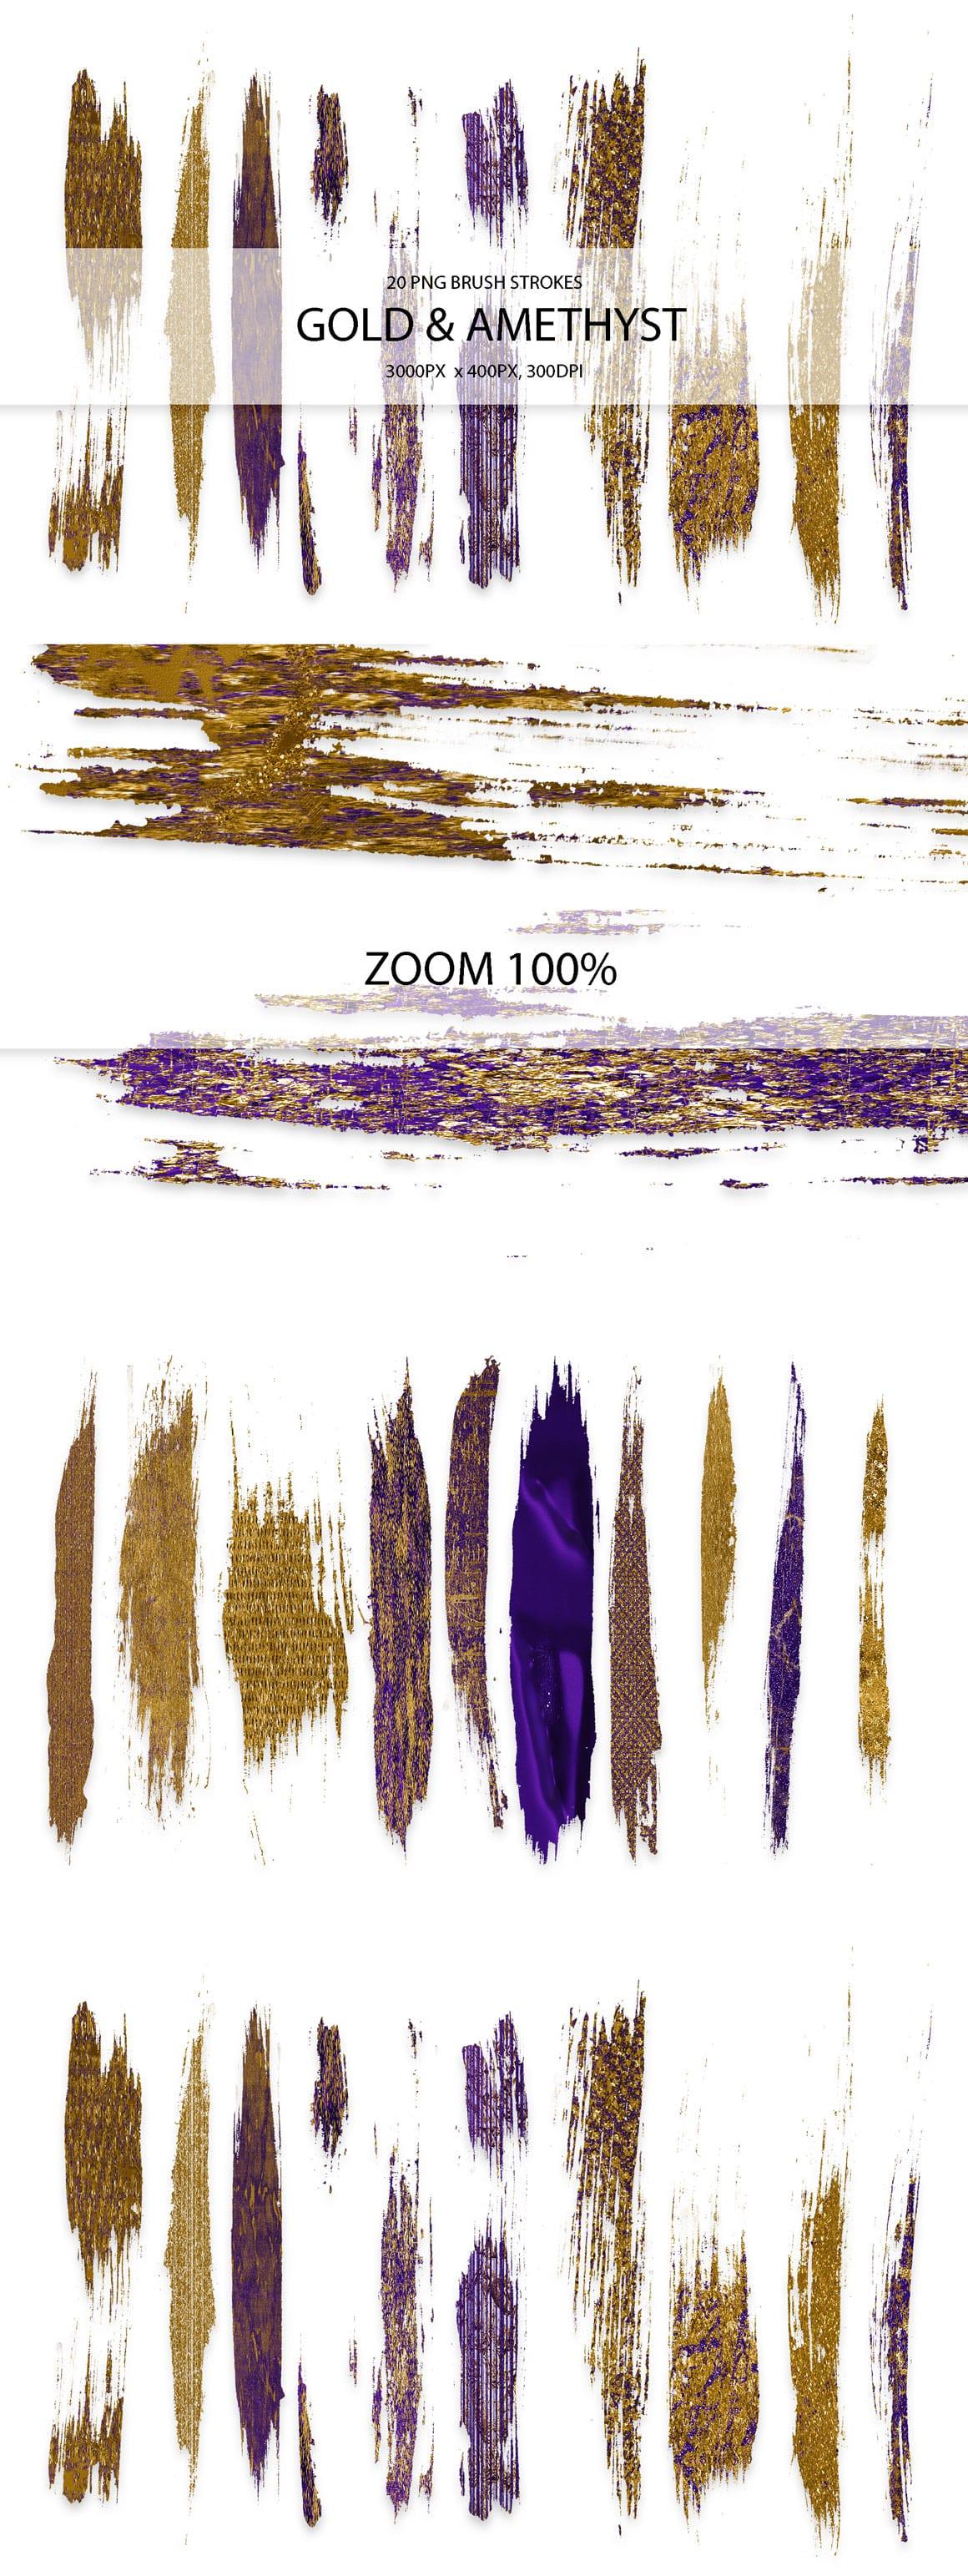 829 Acrylic Brush Strokes and Digital Brush Strokes - $9 - GoldAmethystStrokes 01 min